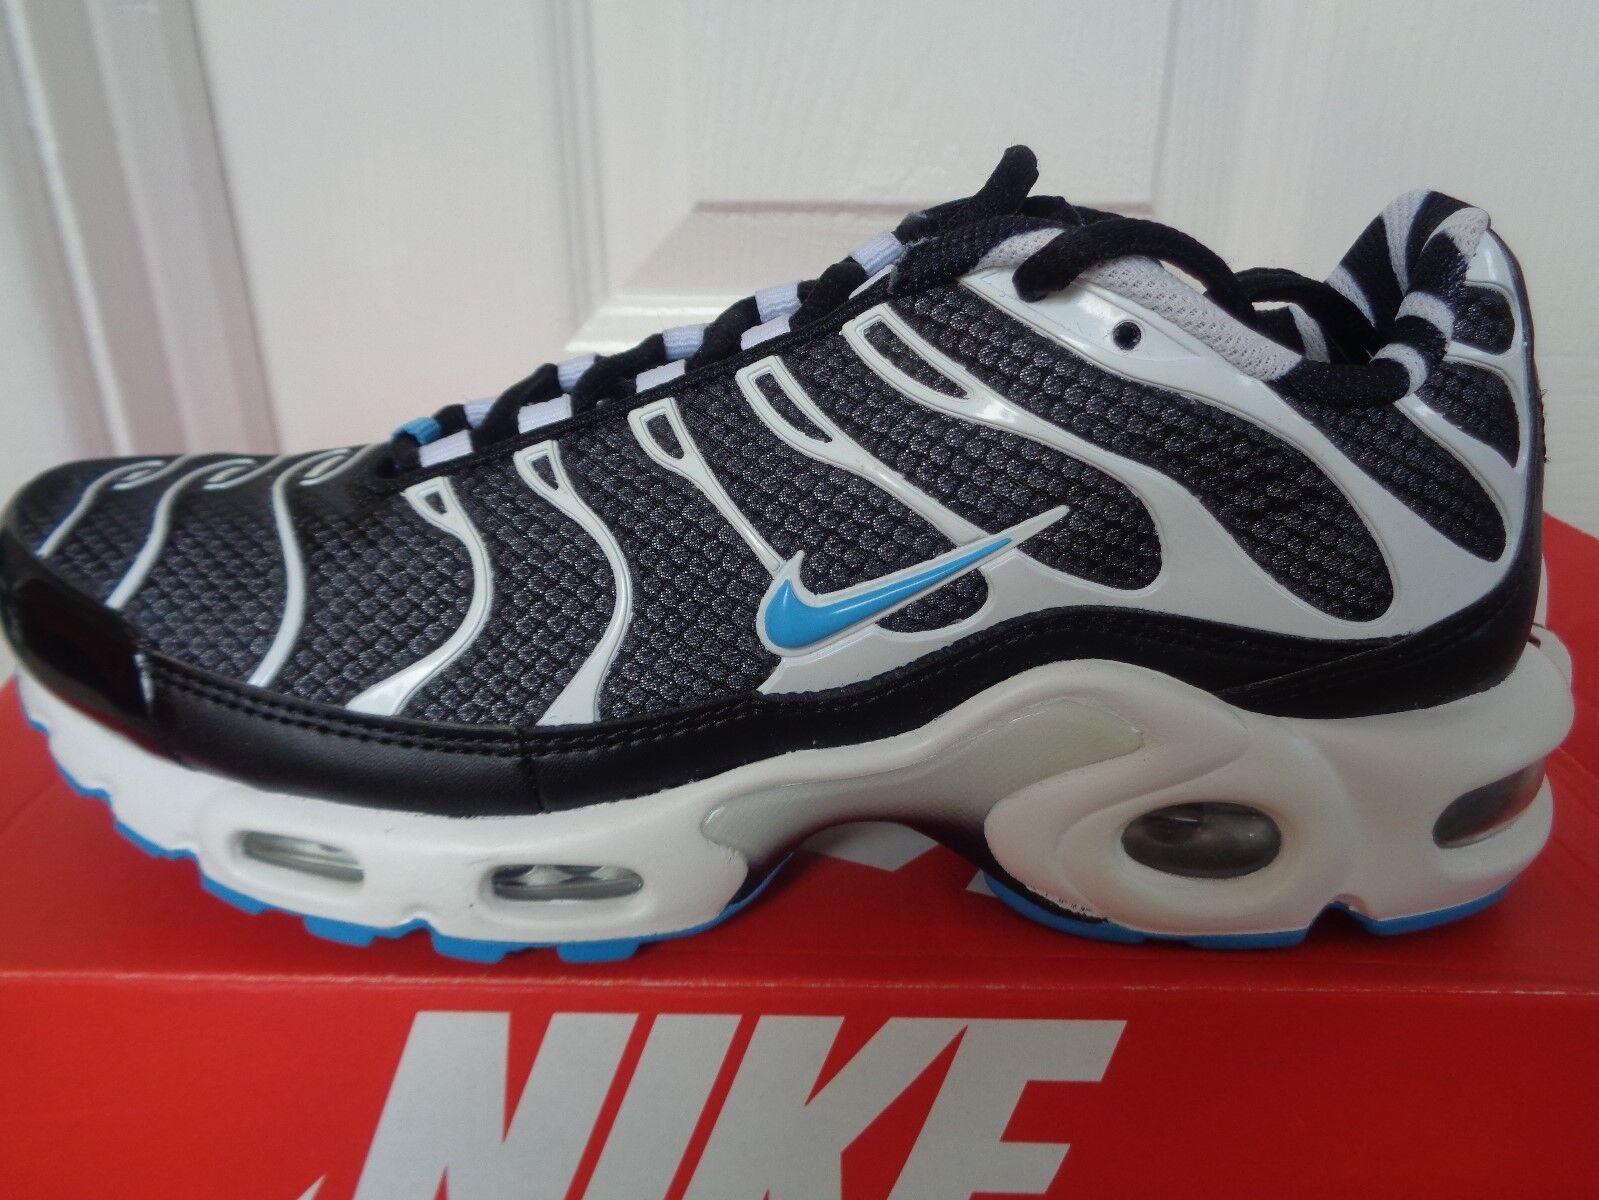 Txt Des Nike Air Max Baskets Chaussures 604133 Formateurs Plus nHHrSYqg